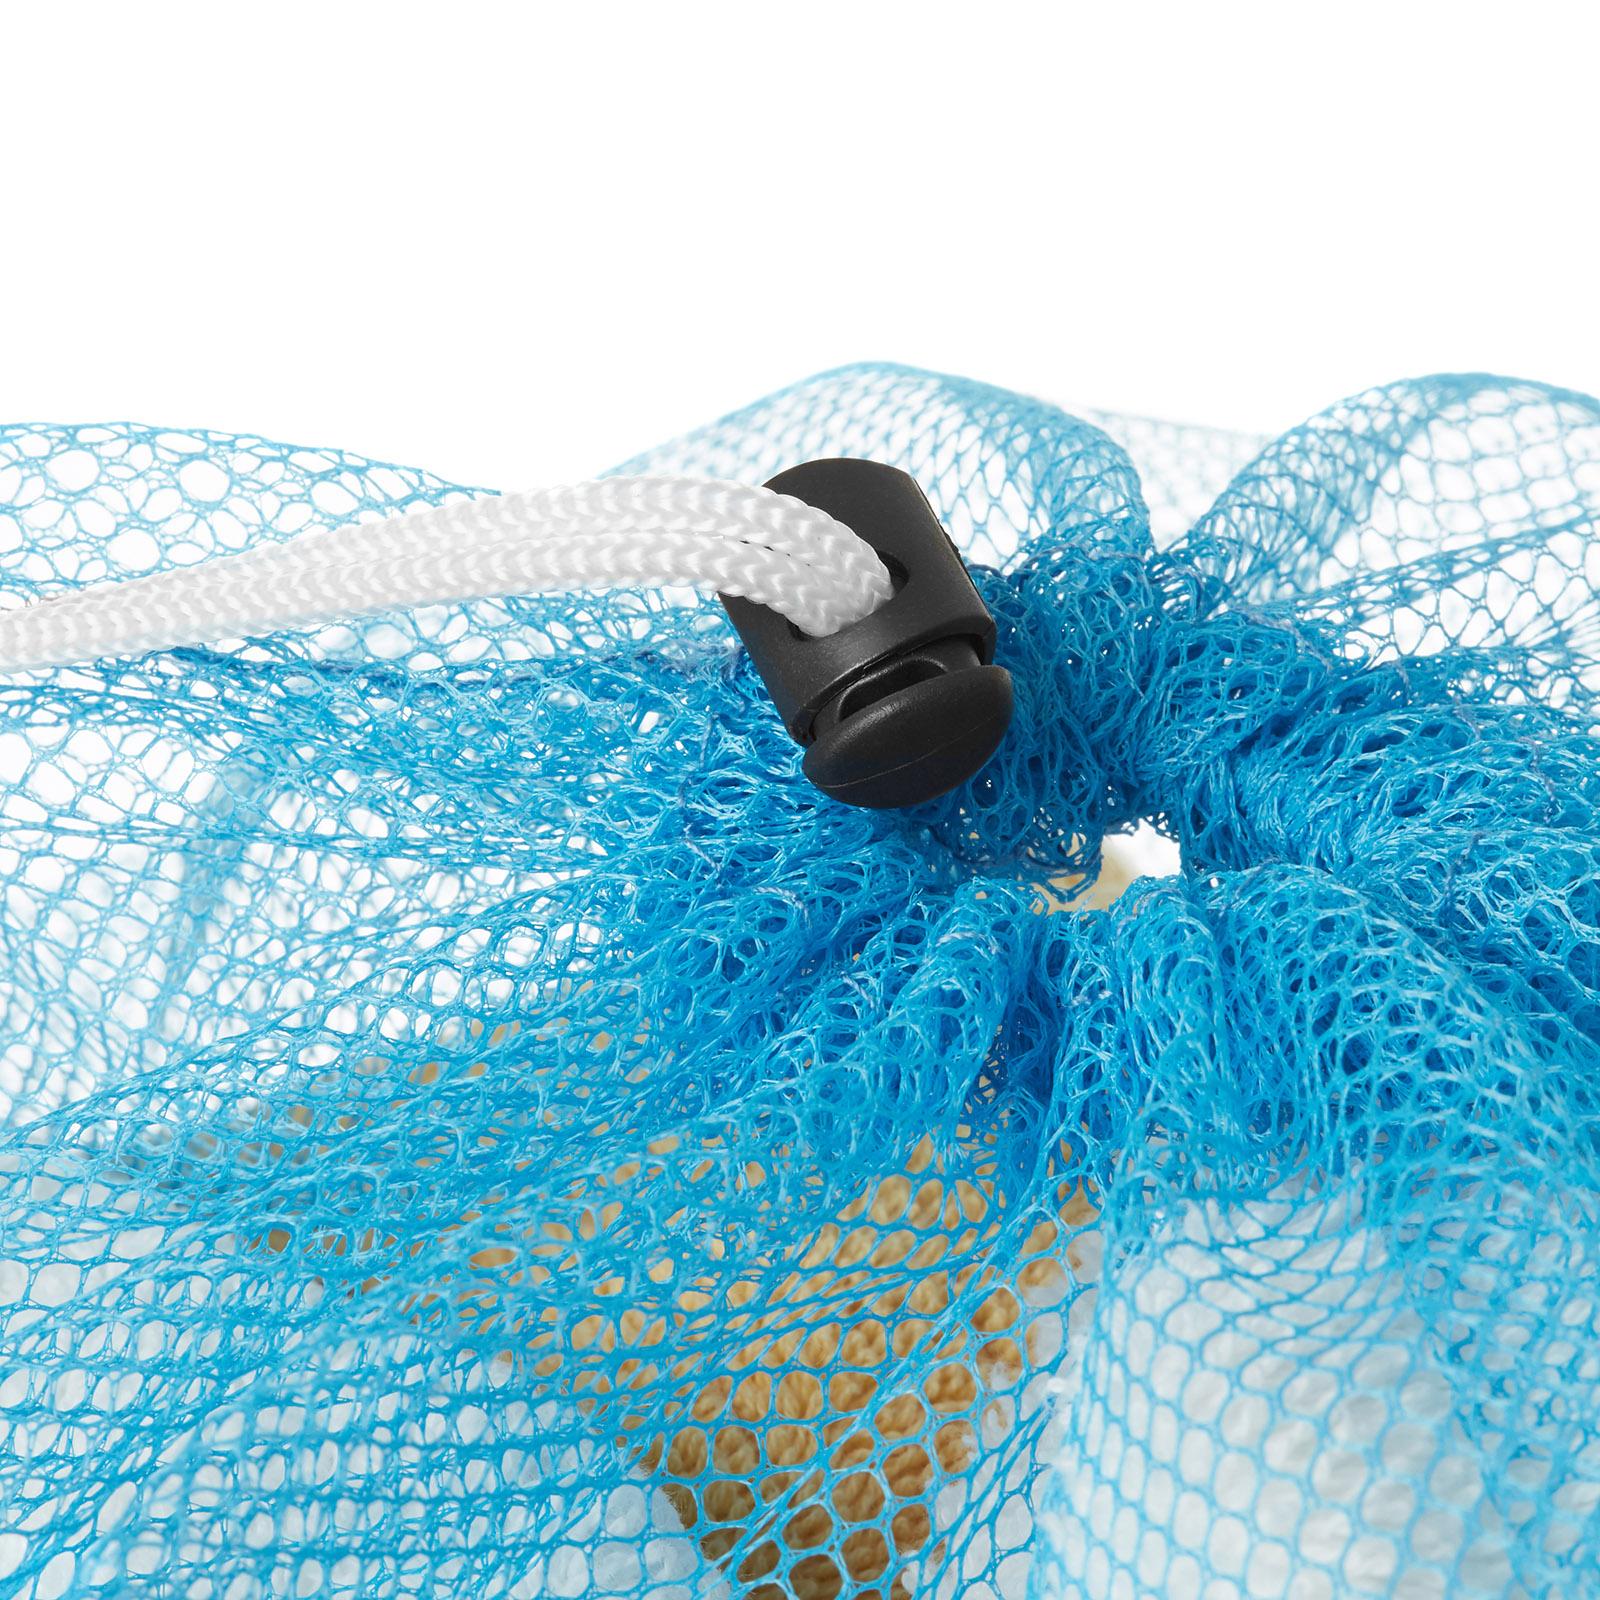 24-034-x-36-034-Large-Heavy-Duty-Mesh-Net-Drawstring-Laundry-or-Equipment-Ball-Bag thumbnail 17